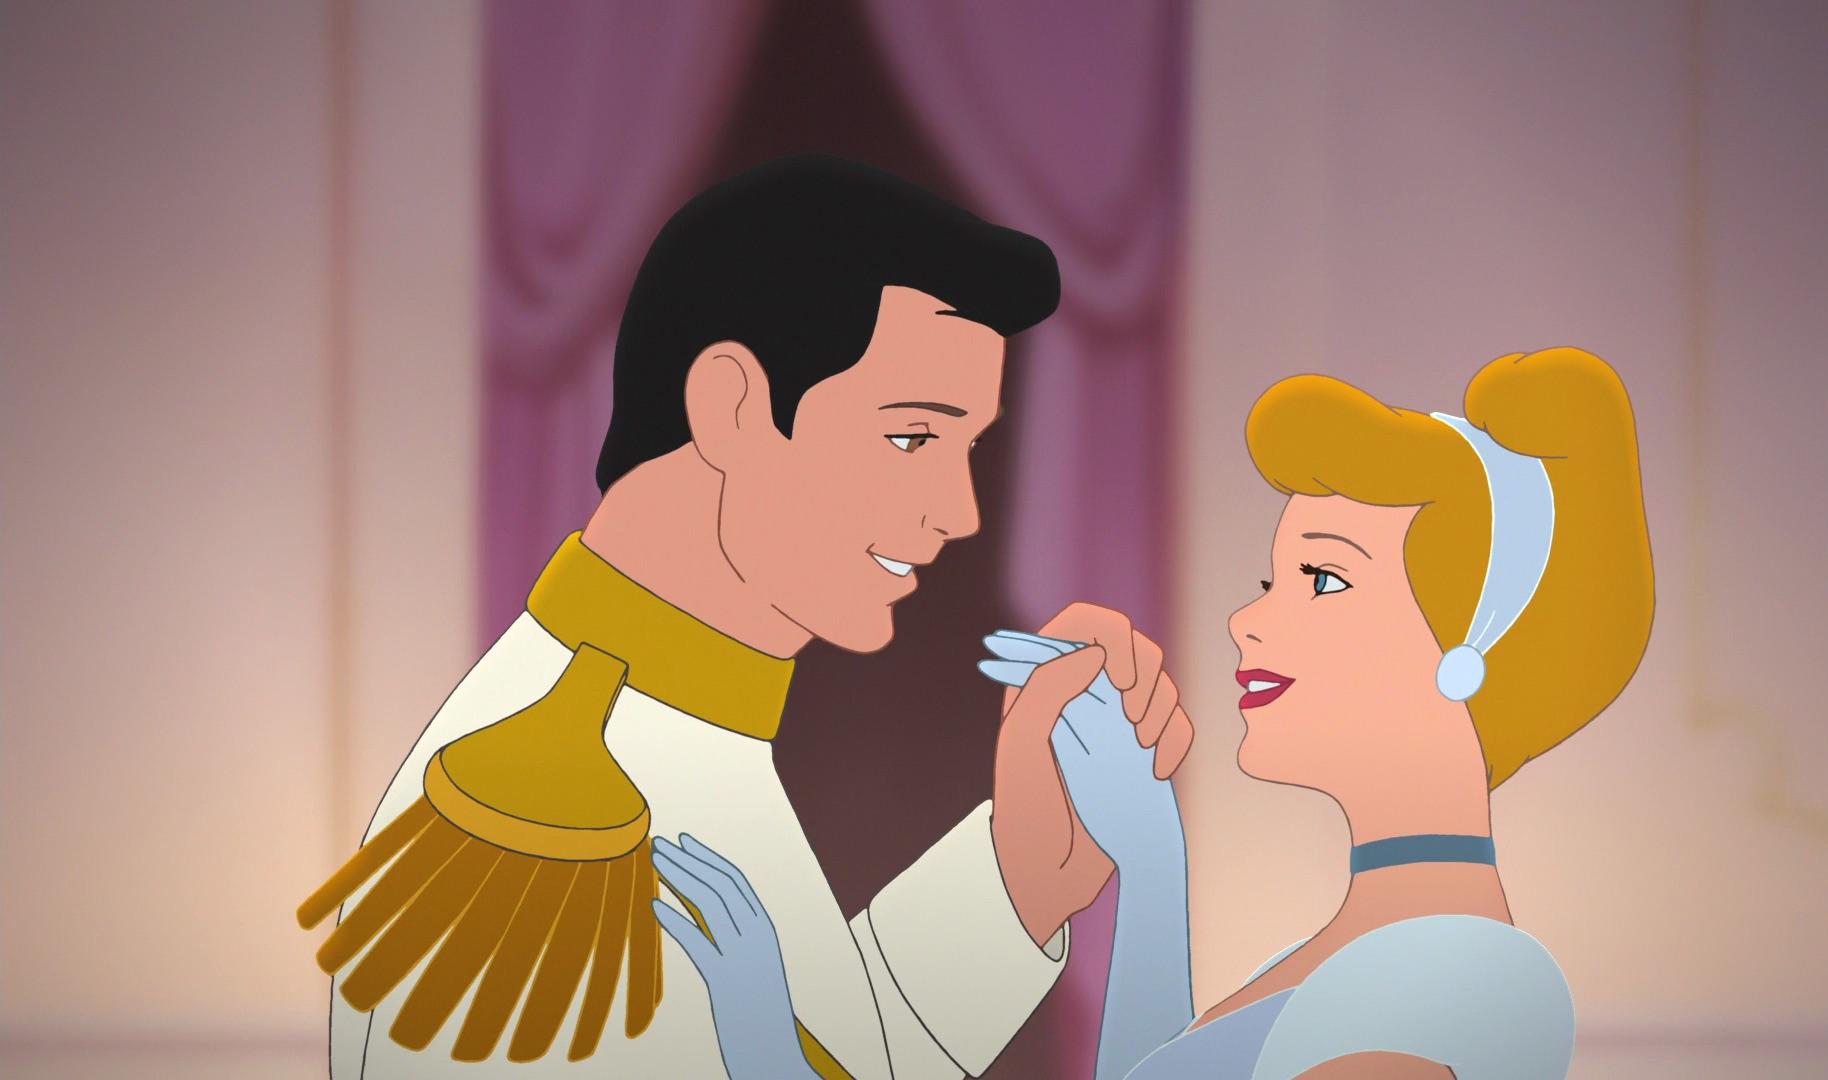 Ten modern Cinderellas who found their princes forecast